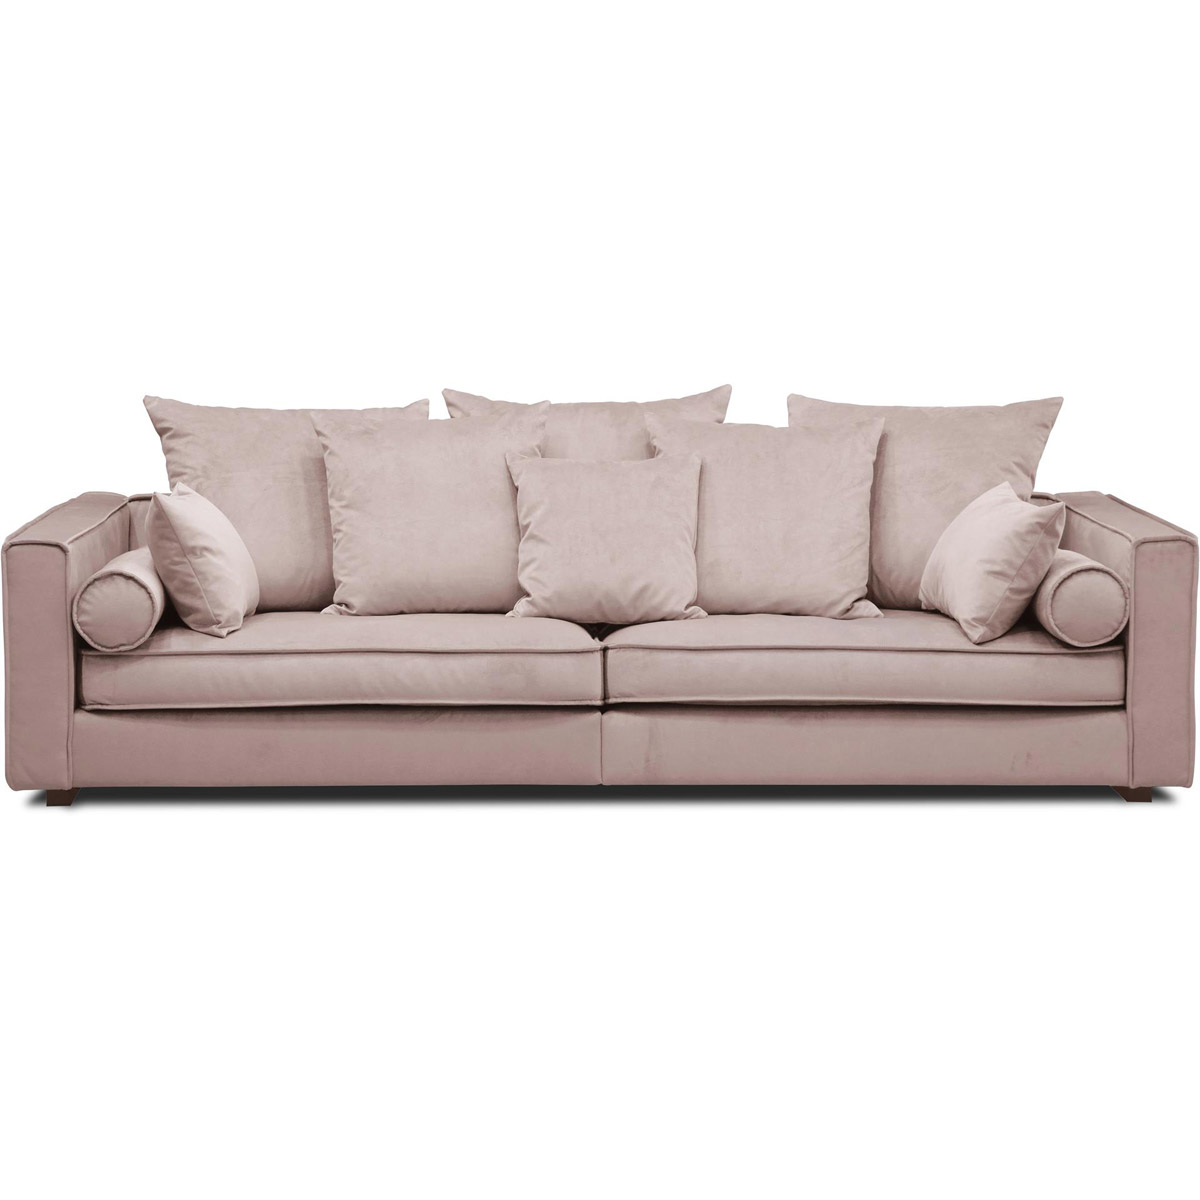 Luca-stor-soffa-3,5-sits-tyg-möbelmästarna